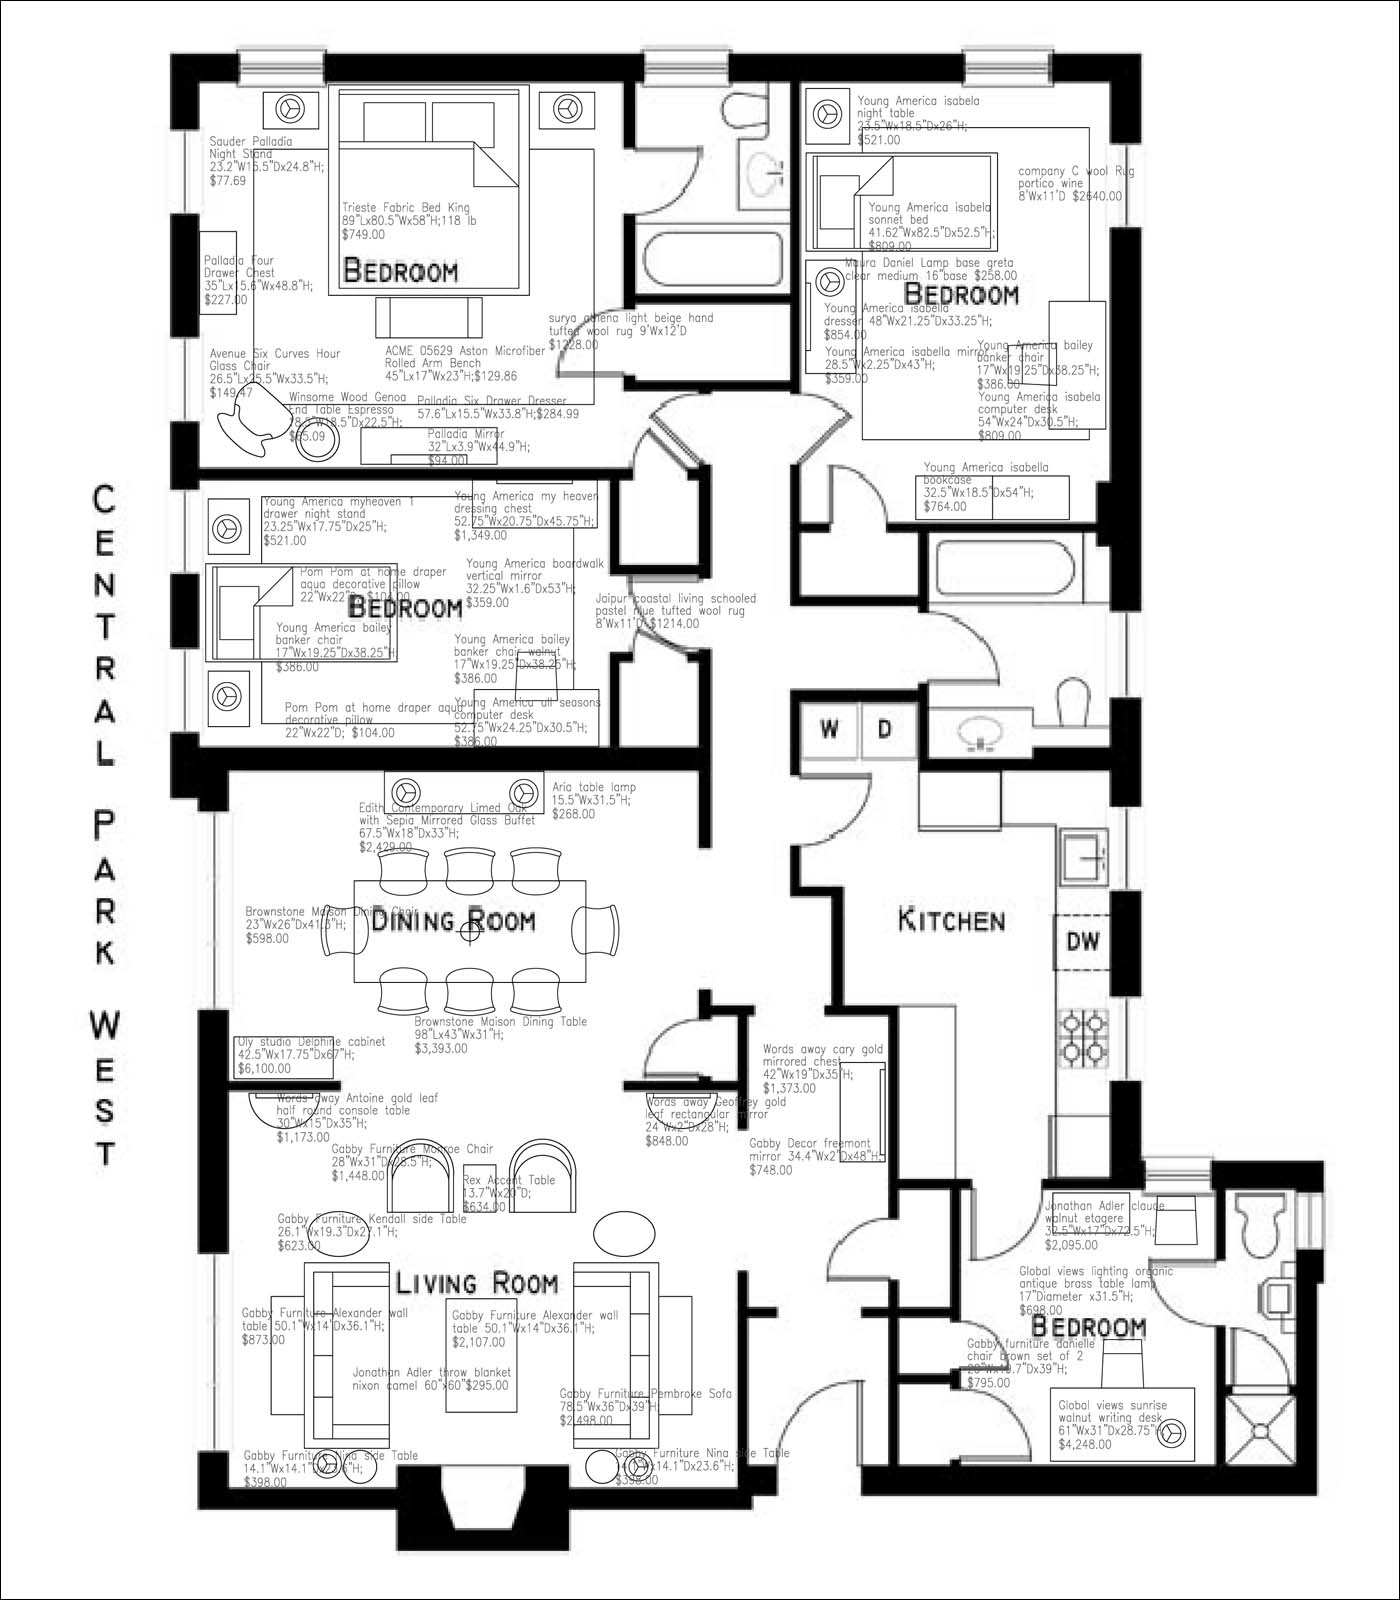 Furnish It: 370 Central Park West, Apartment 201